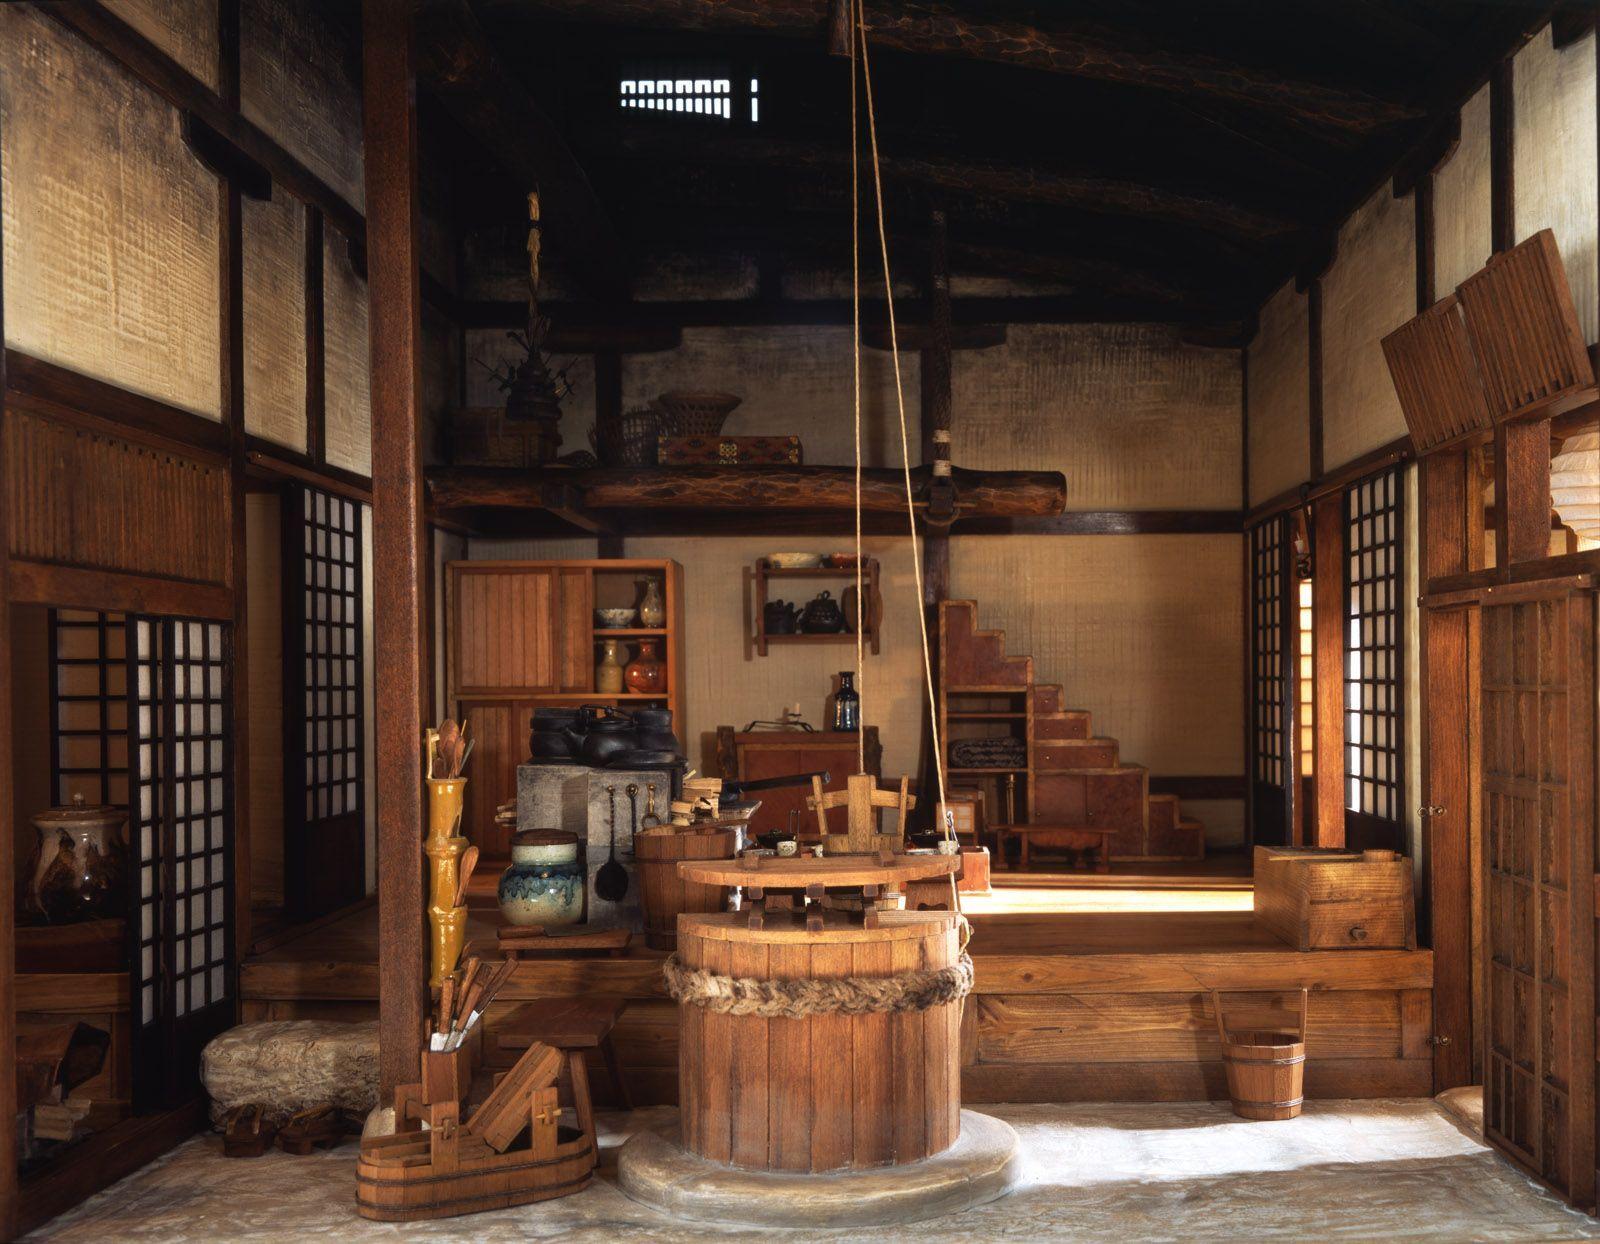 31 inspiring japanese kitchen style my little think สถาปน ก งานไม on kitchen interior japanese style id=12748